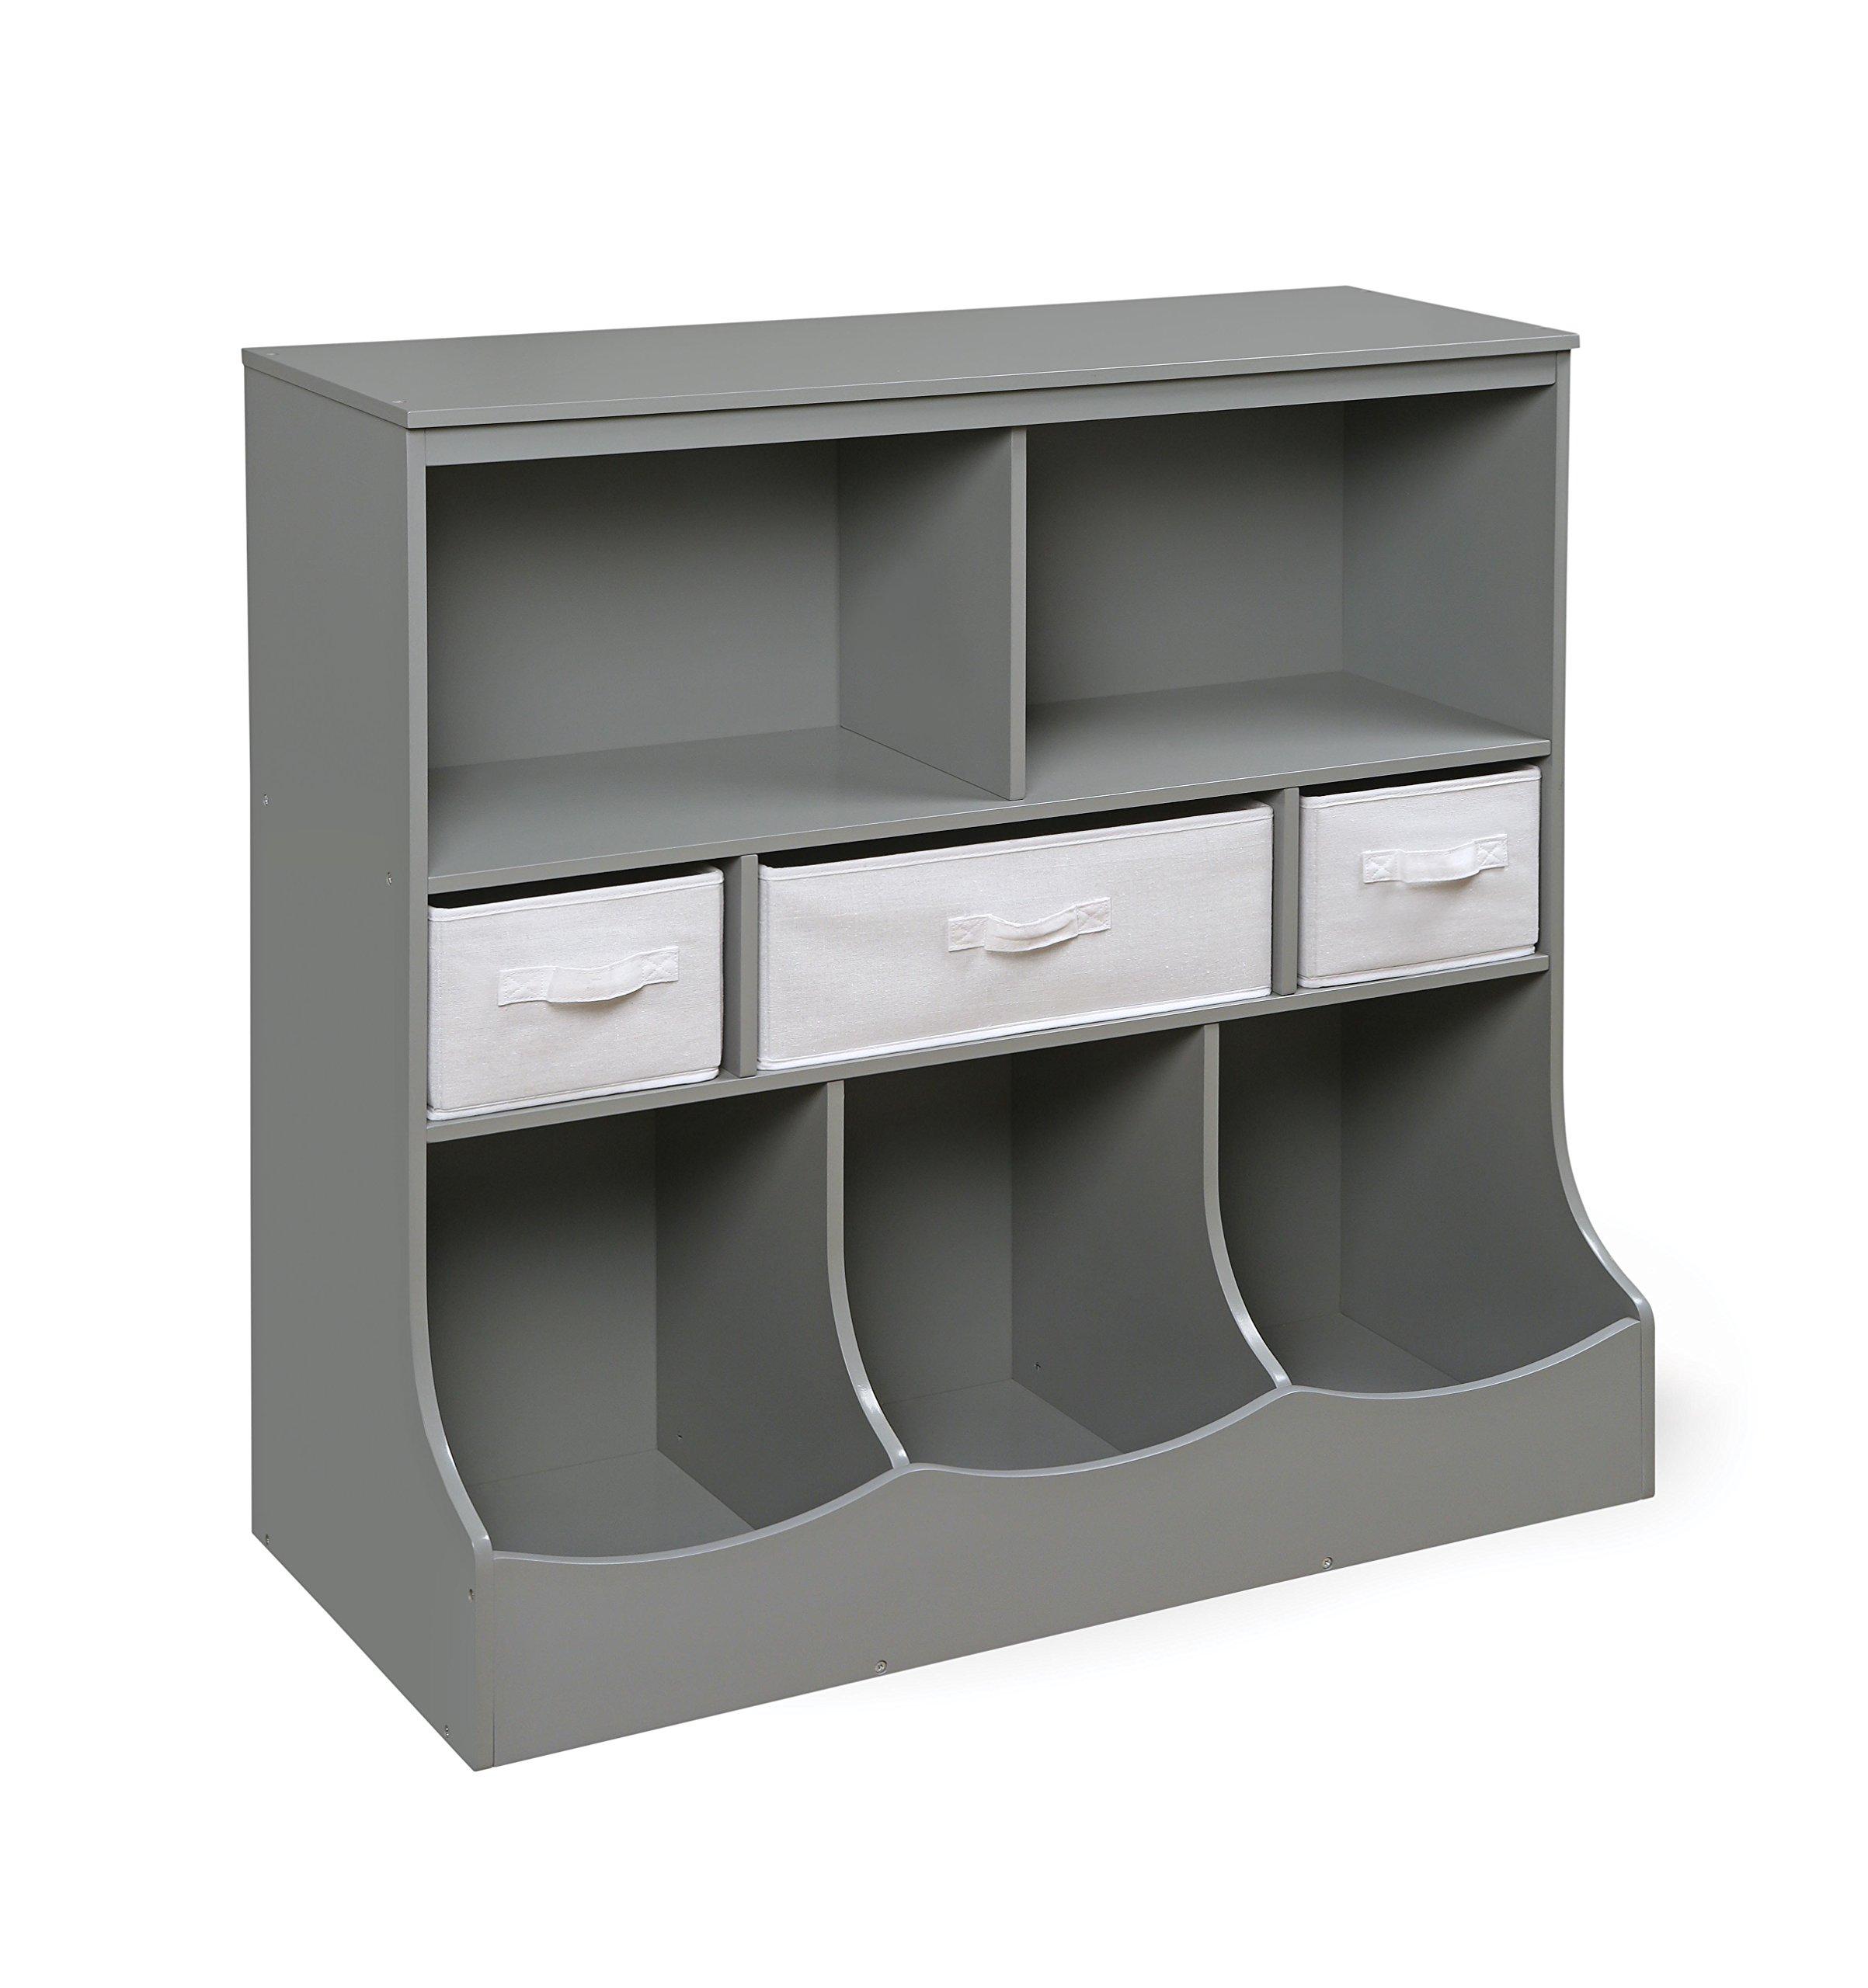 Badger Basket Combo Bin Storage Unit with Three Baskets, Gray